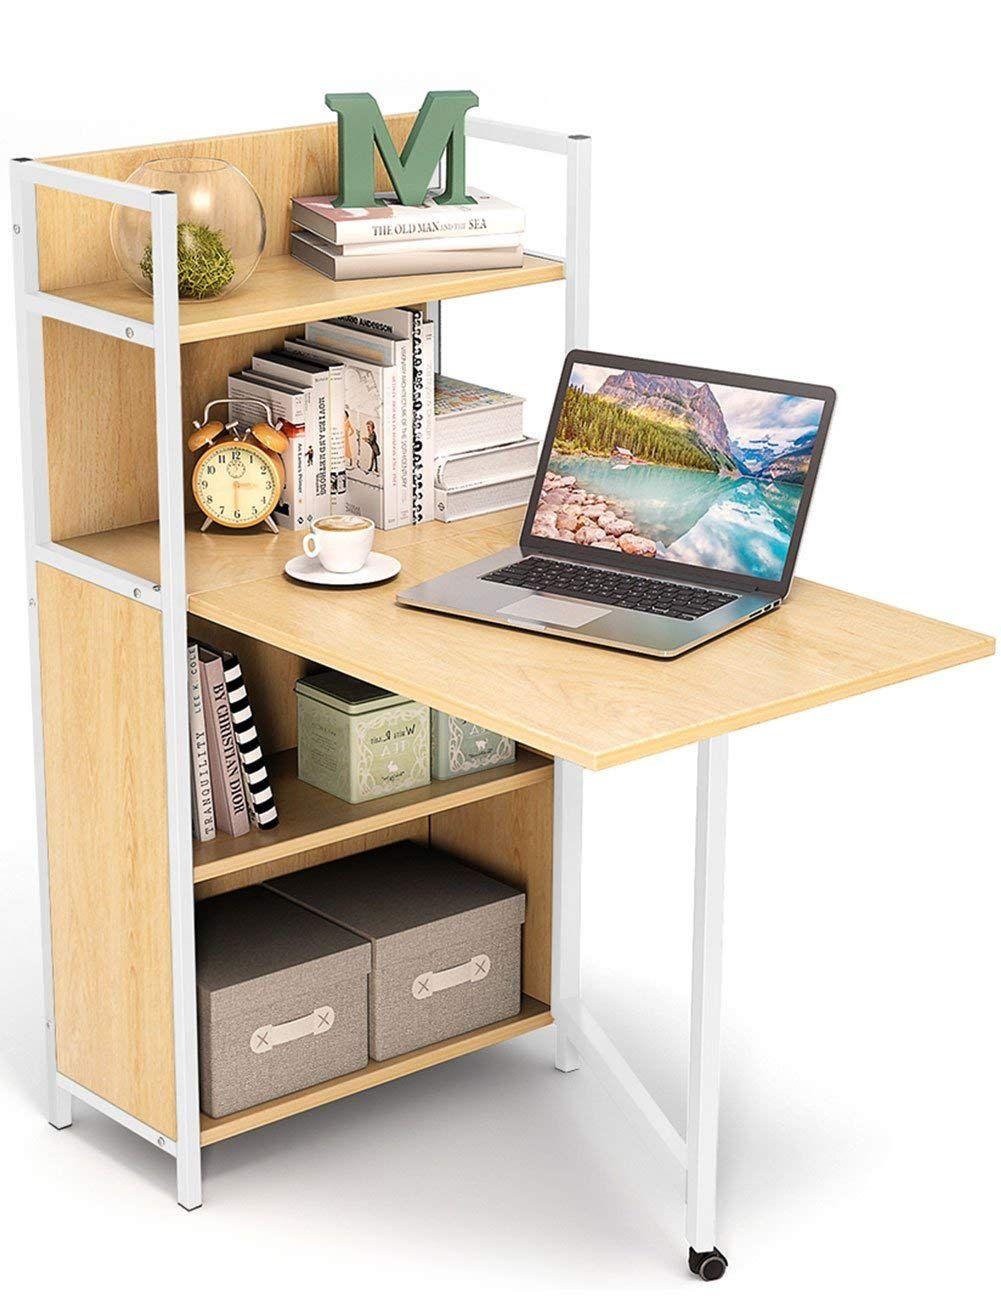 Bamboo Empty Desktop Bookshelf Simple Storage Rack Student Office Mini Bookcase Storage Desk Organizer File Shelves Size L53cm Fai Da Te